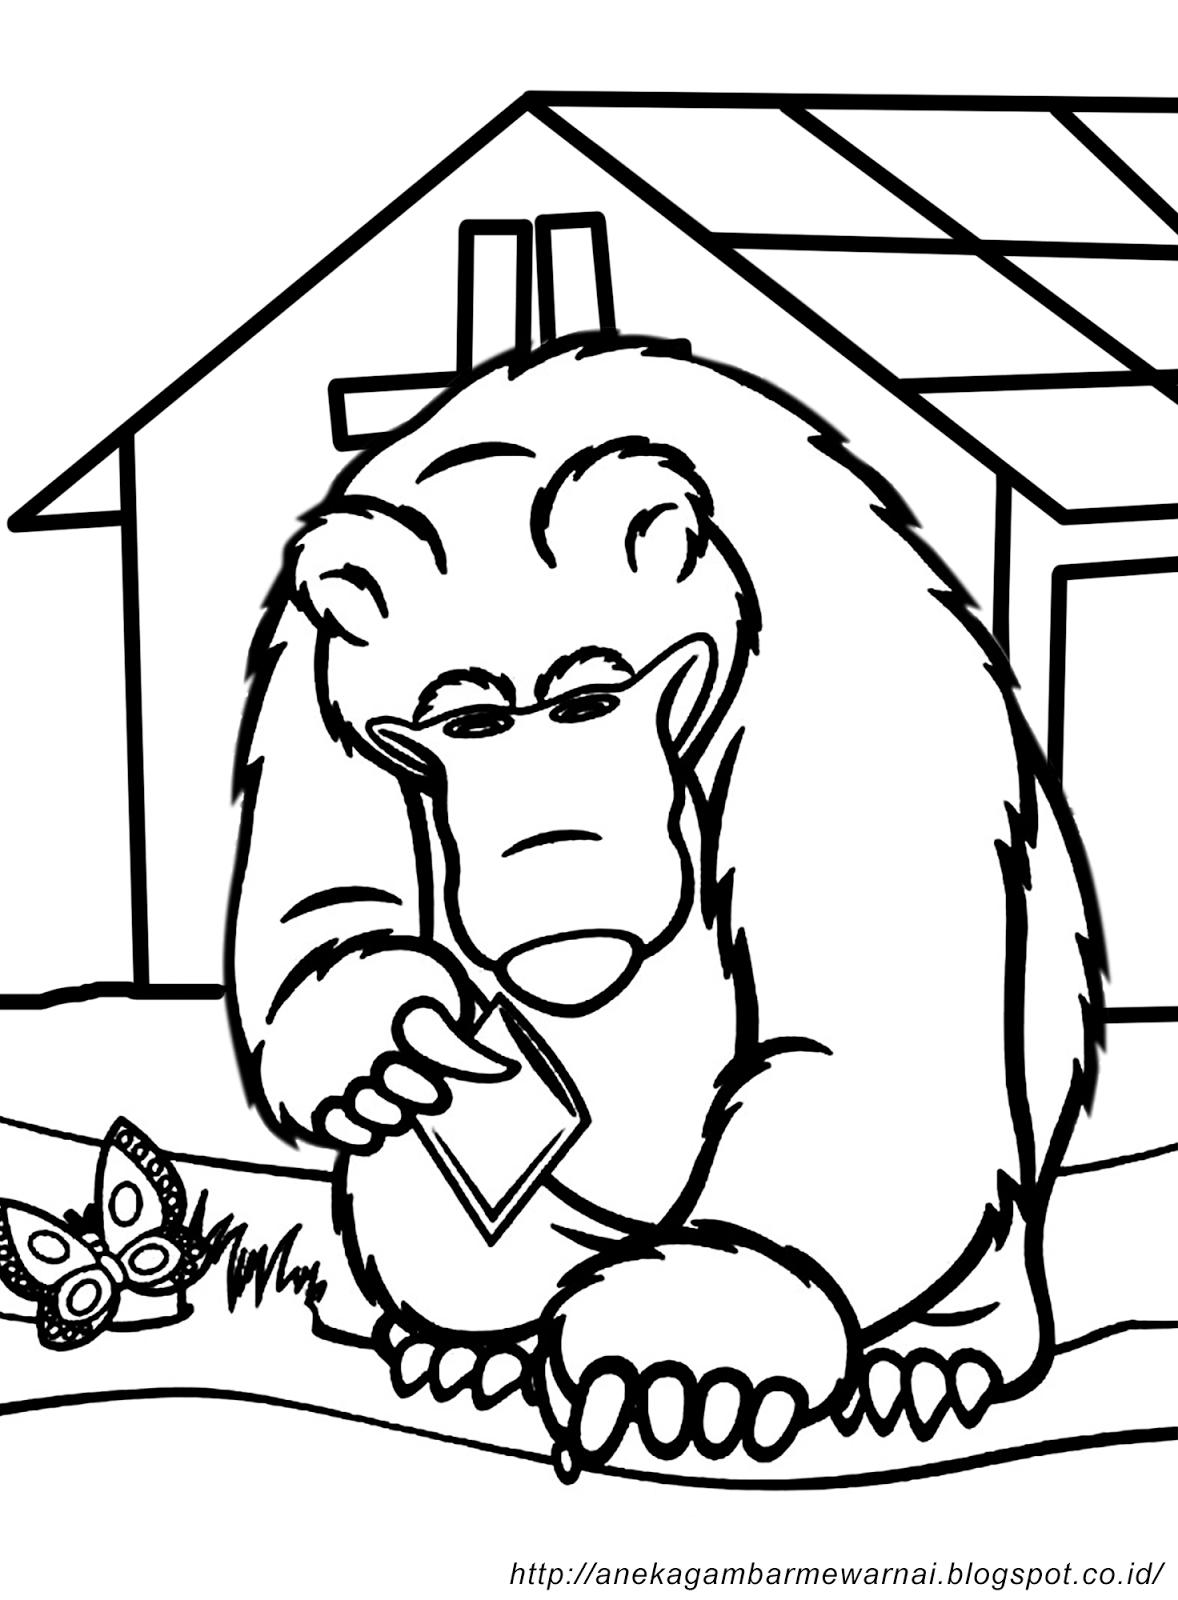 Gambar Mewarnai Masha And The Bear Untuk Anak Paud Dan Tk